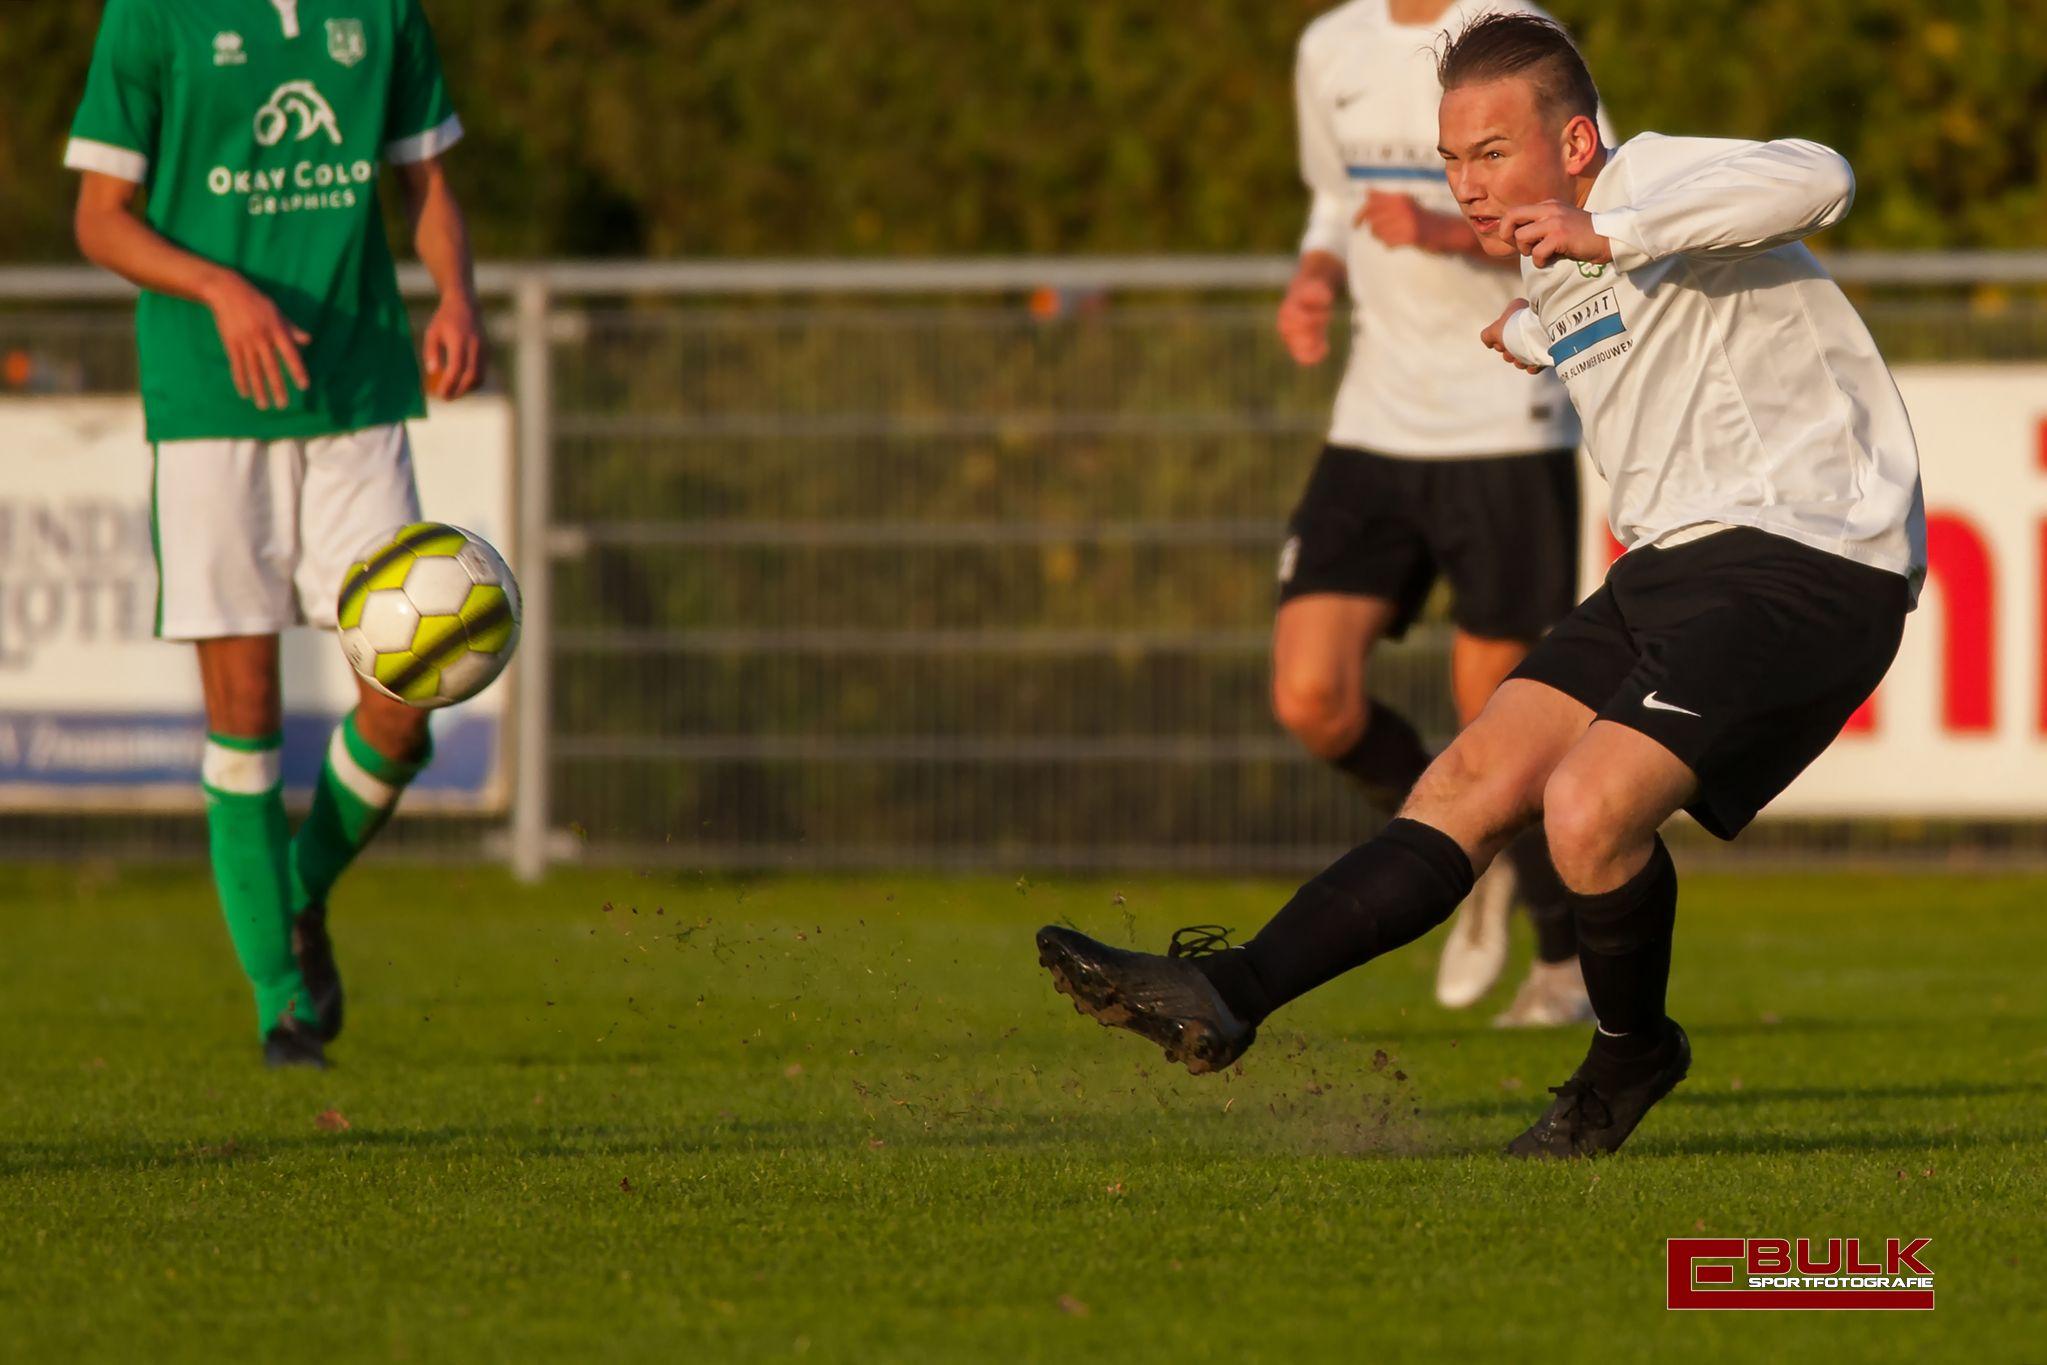 ebs_0743-ed_bulk_sportfotografie